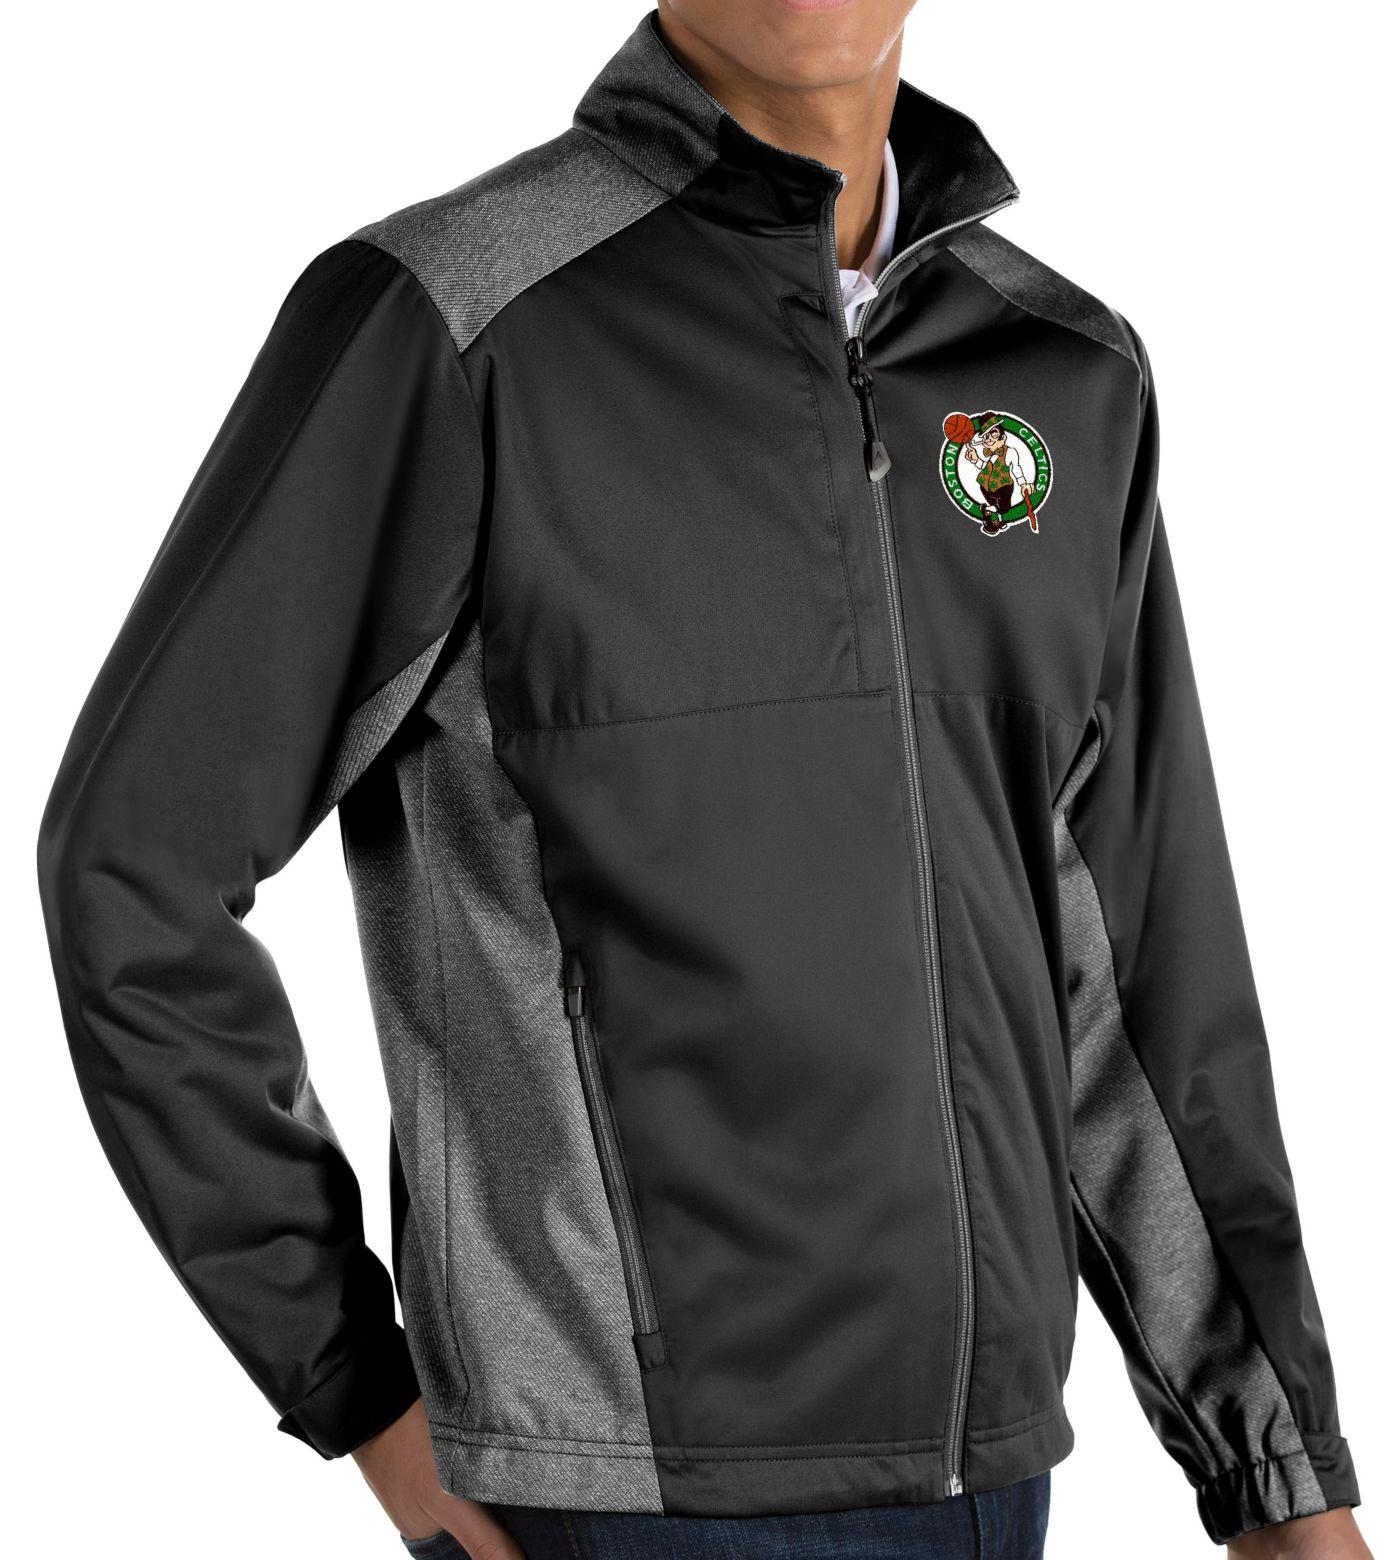 Antigua Men's Boston Celtics Revolve Full-Zip Jacket